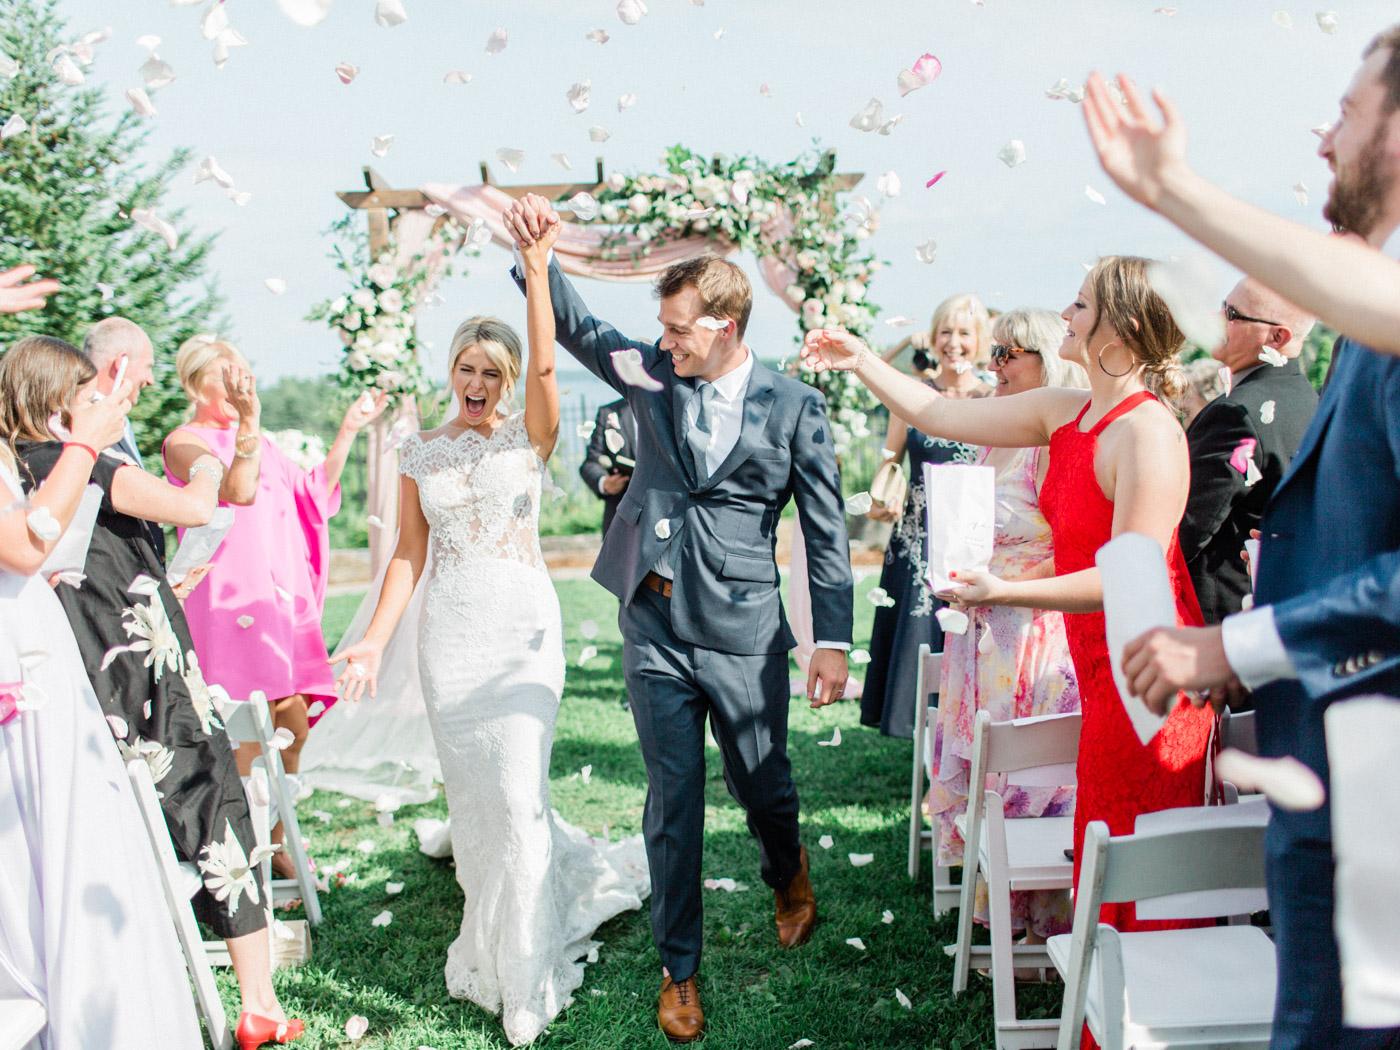 Toronto-Muskoka-wedding-photographer-summery-fun-documentary-the-marriott-rosseau88.jpg